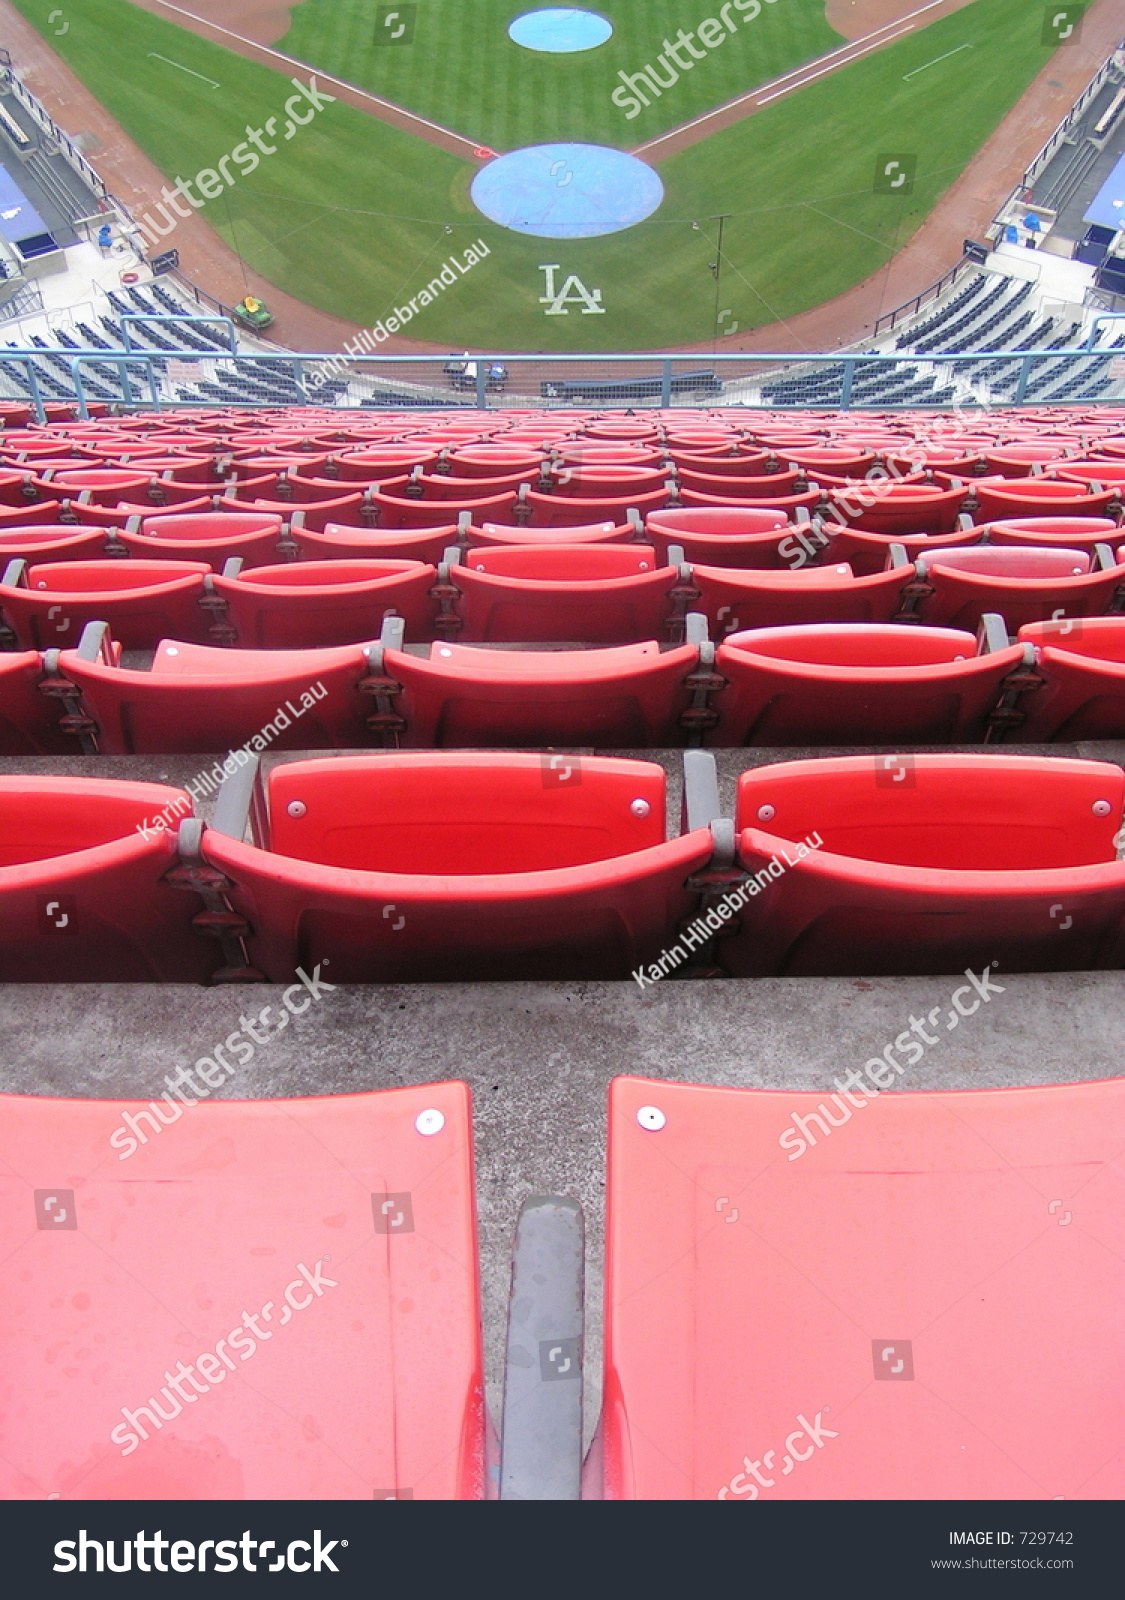 Nosebleed seats dodgers stadium los angeles stock photo 729742 nosebleed seats at dodgers stadium los angeles california buycottarizona Image collections